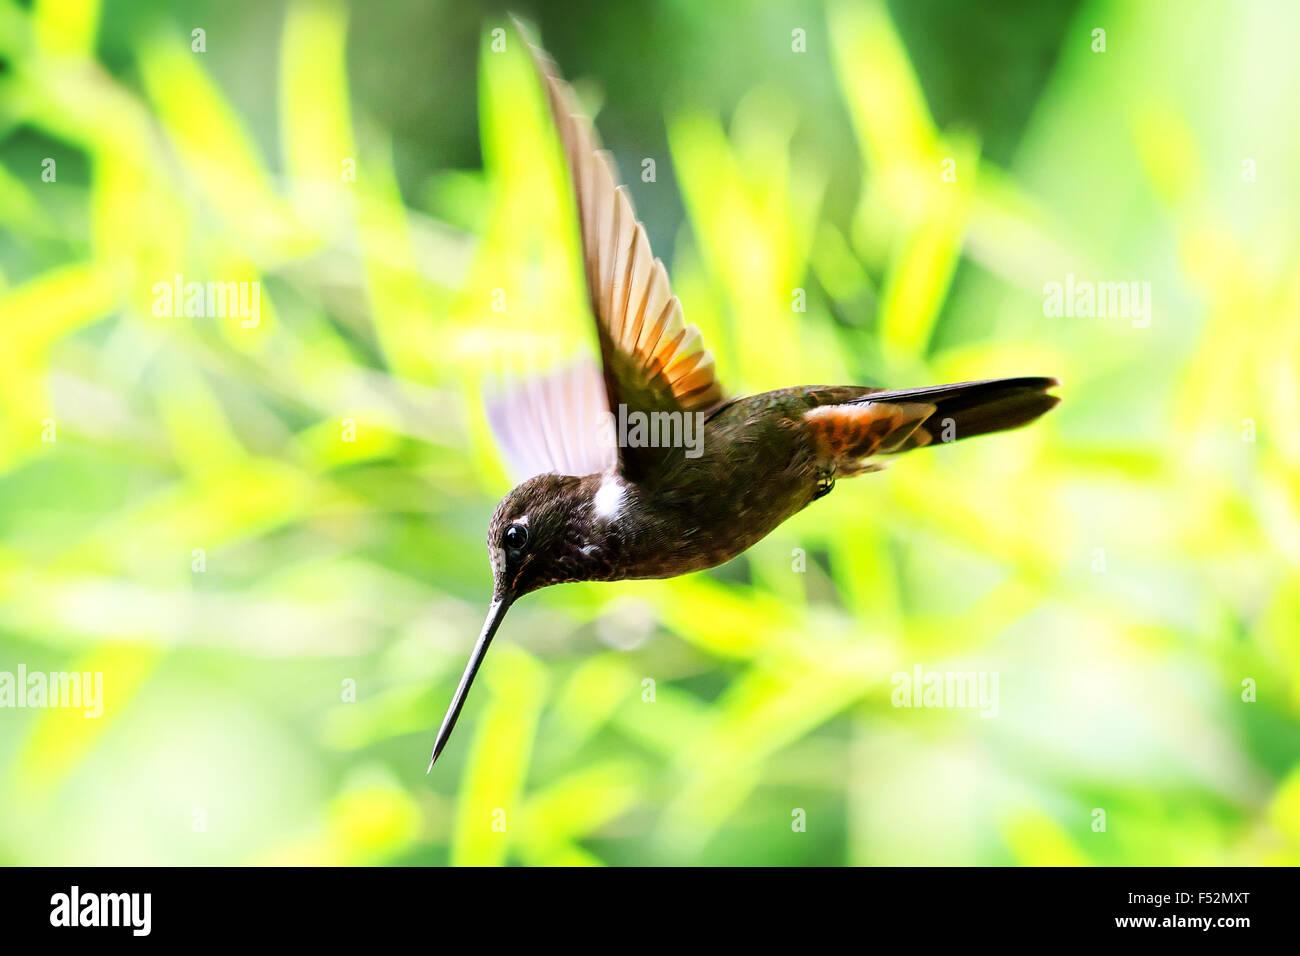 Very Small Hummingbird Collared Inca In Flight Shot In Ecuadorian Rainforest - Stock Image